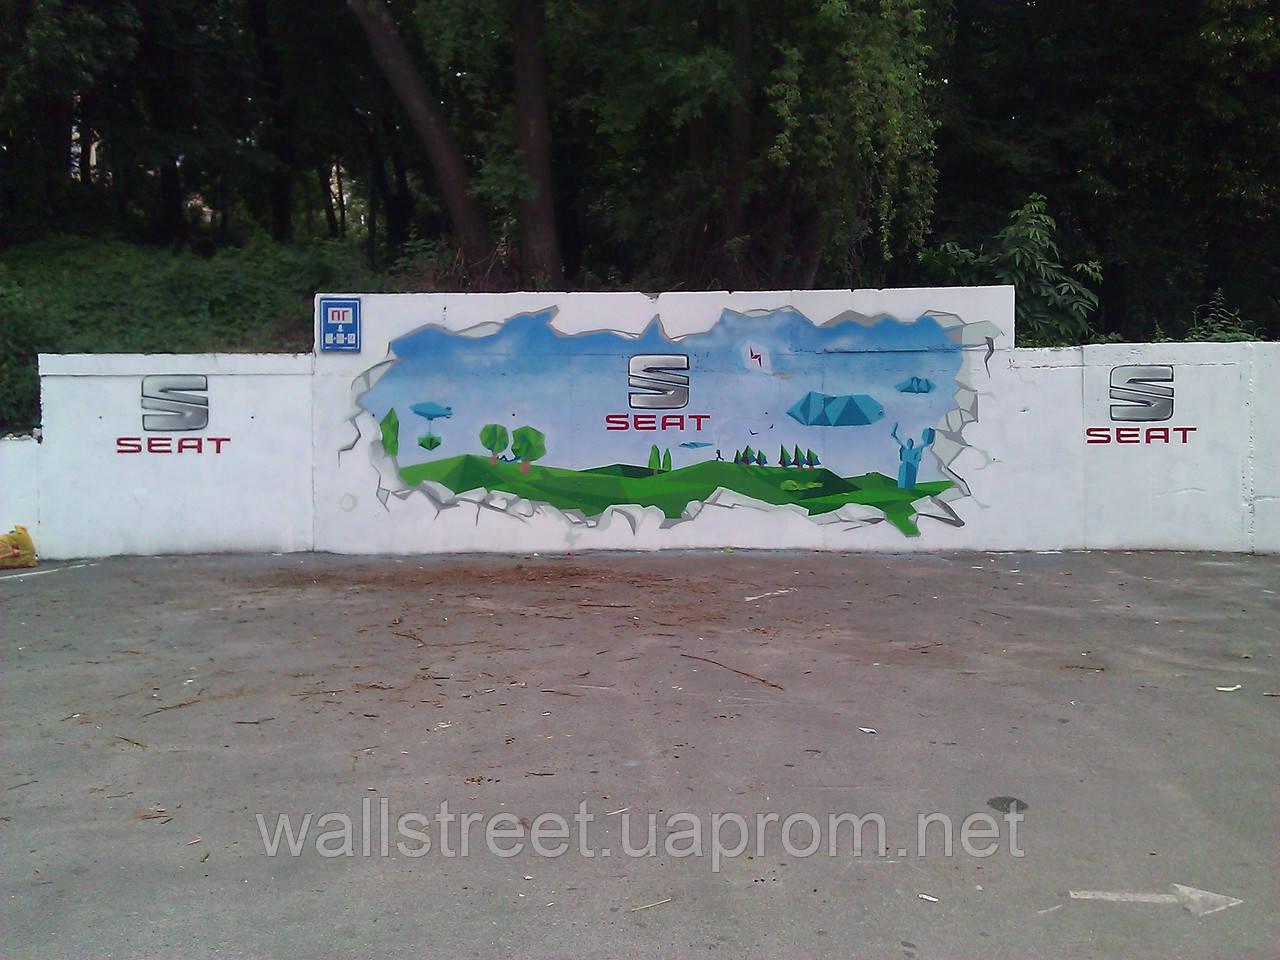 Graffiti advertising